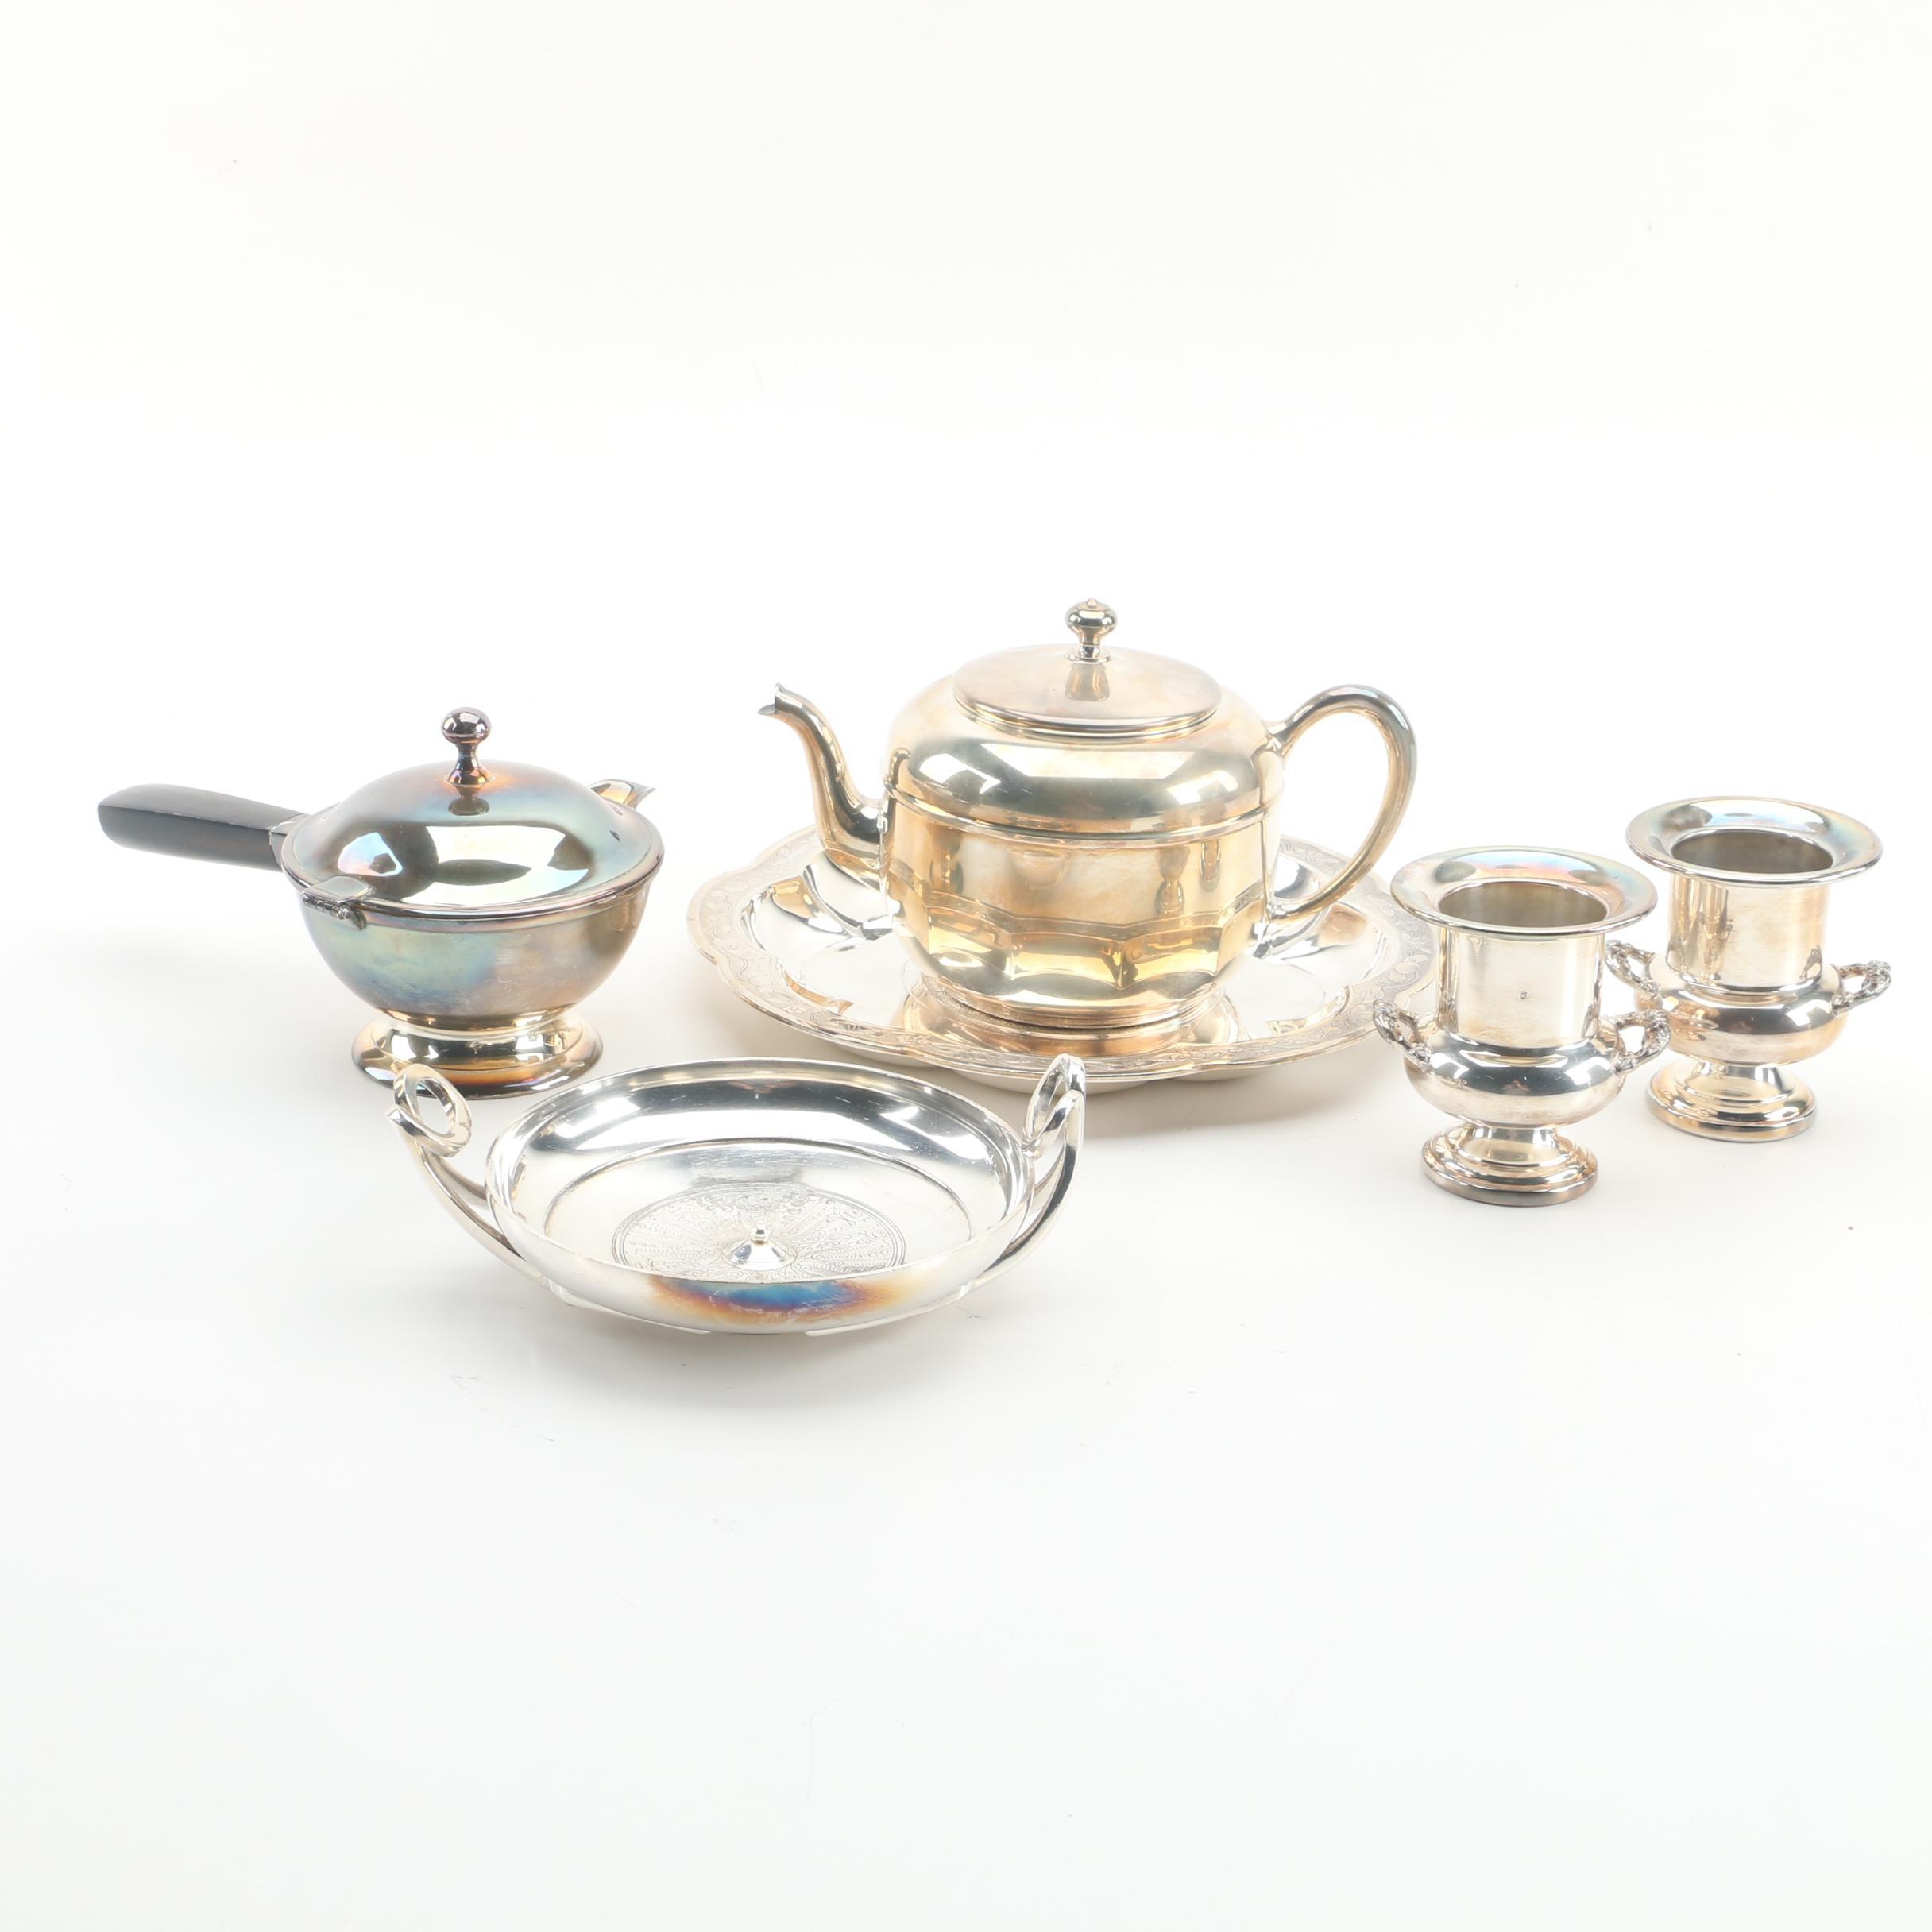 "Gorham ""Greek Kylix"" Bowl with Other Silver Plate Serveware"